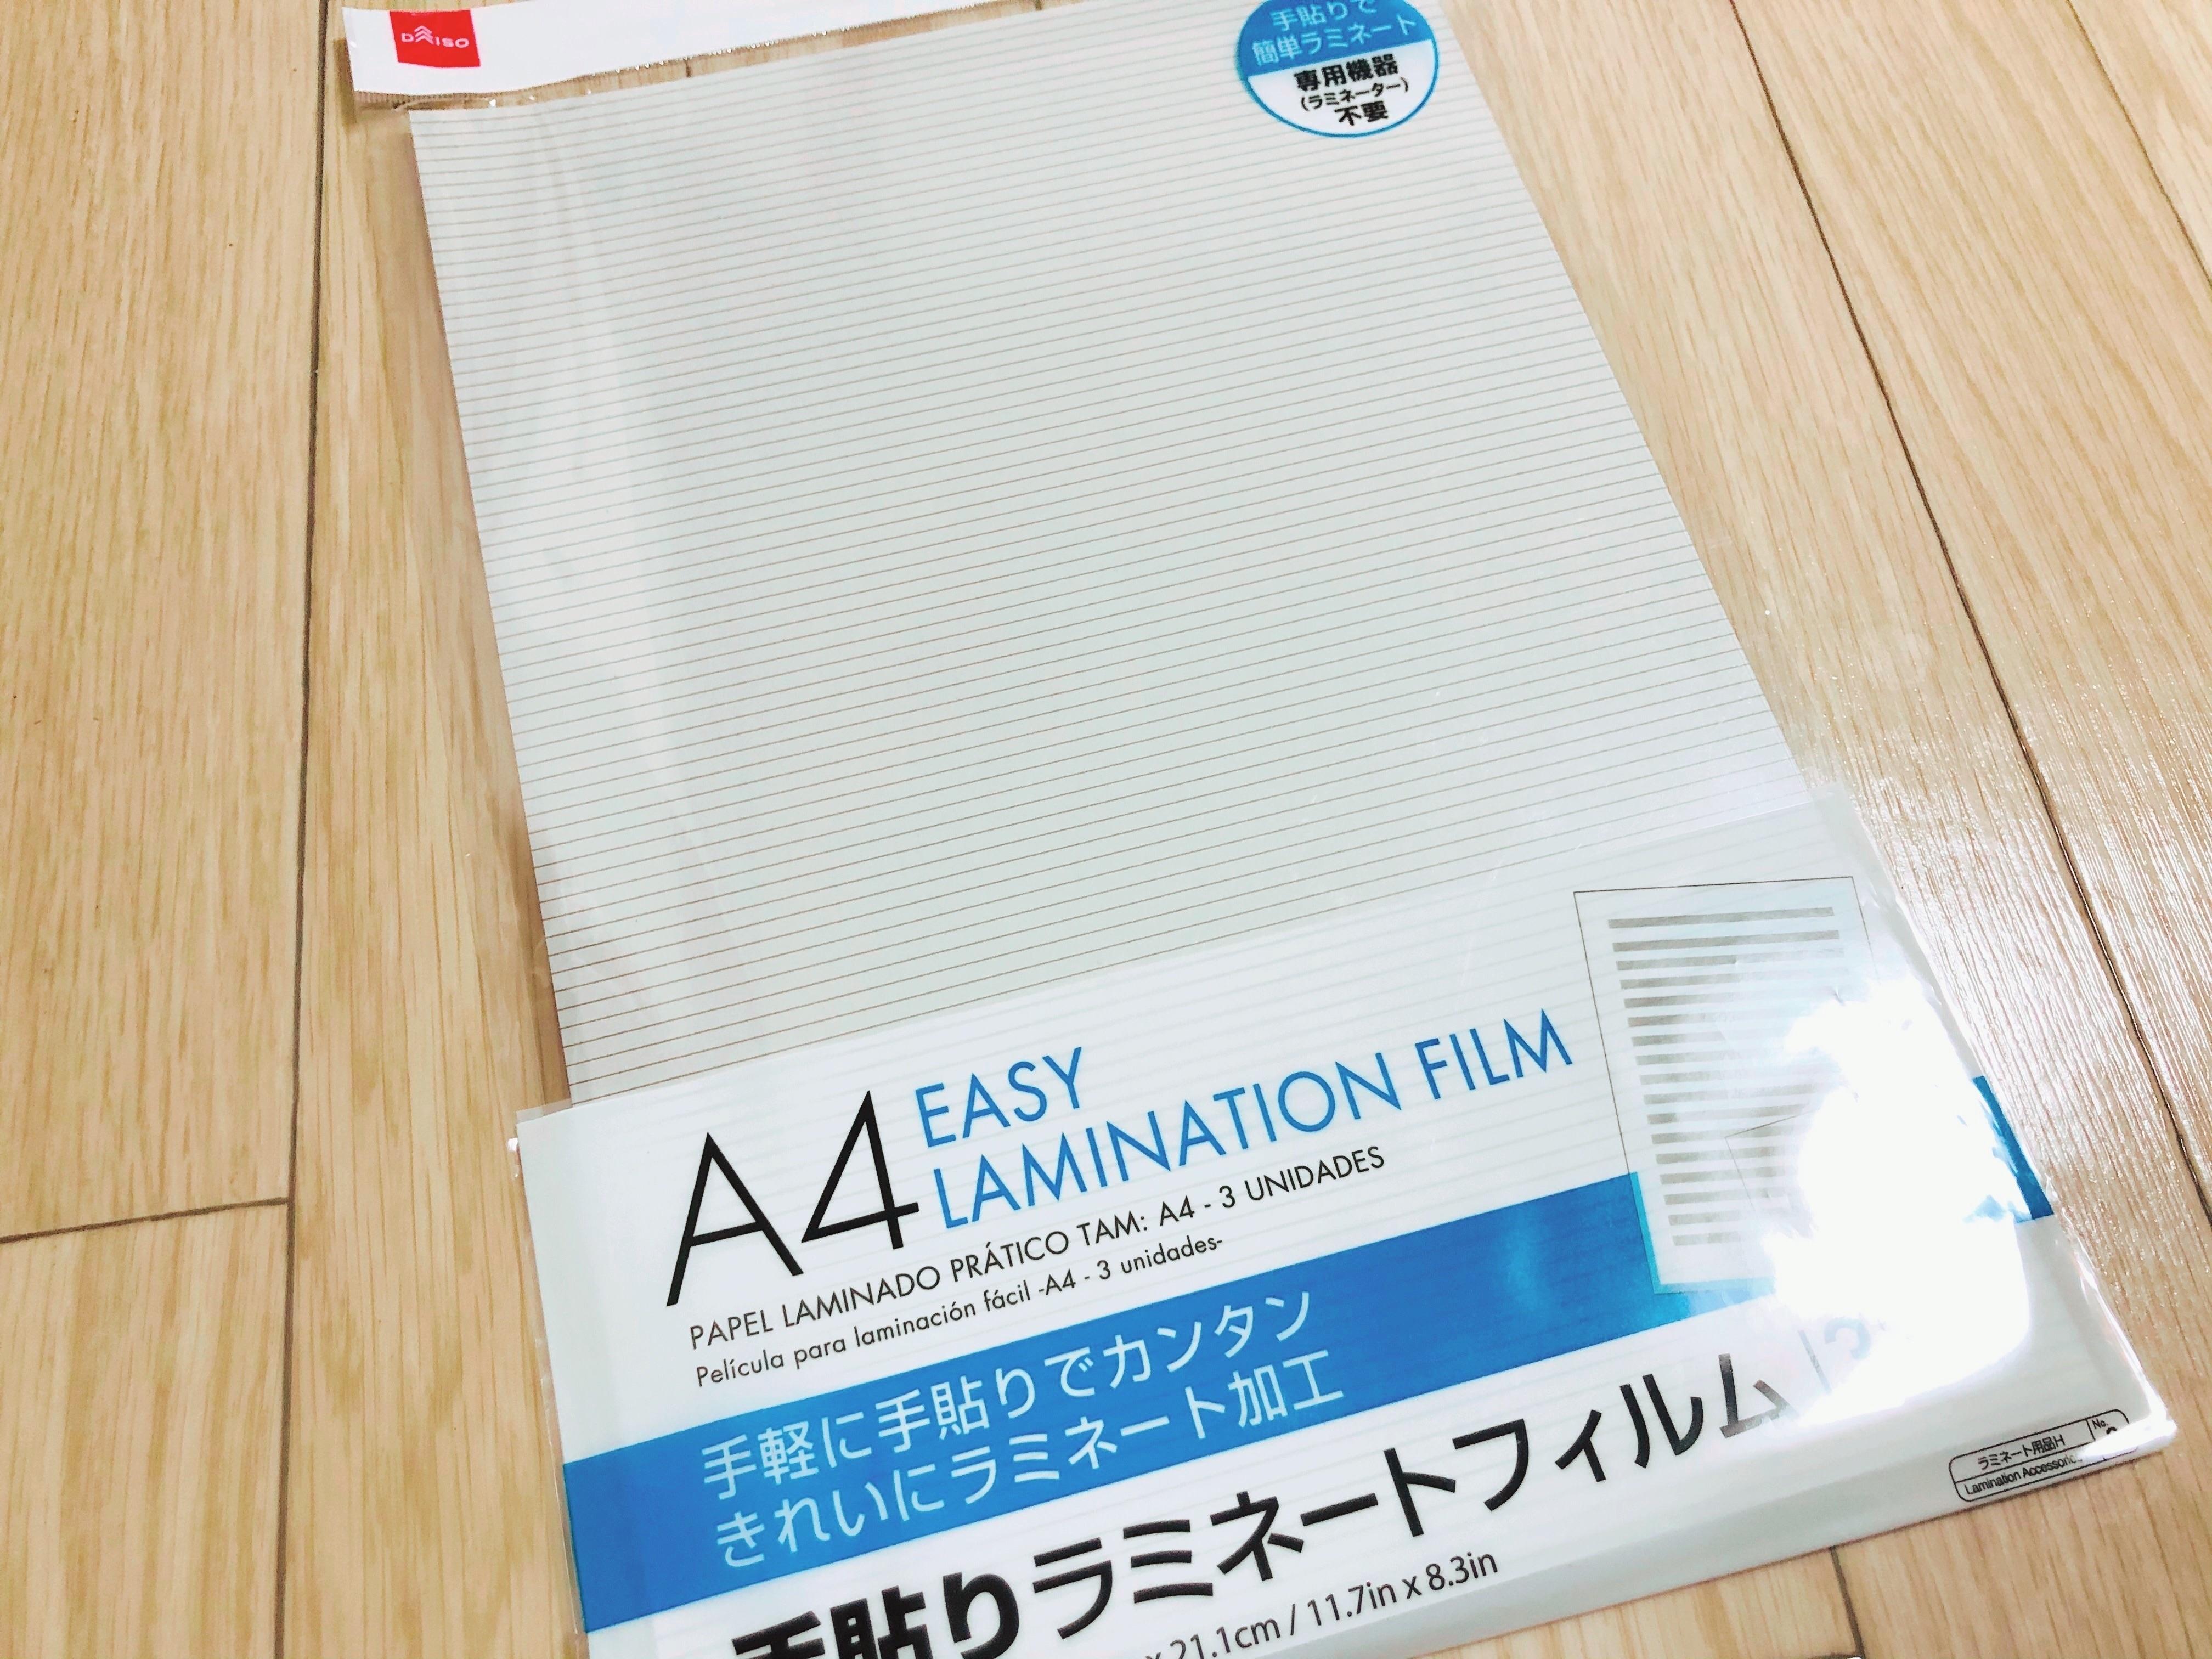 f:id:norimono-chiiku:20200131004527j:plain